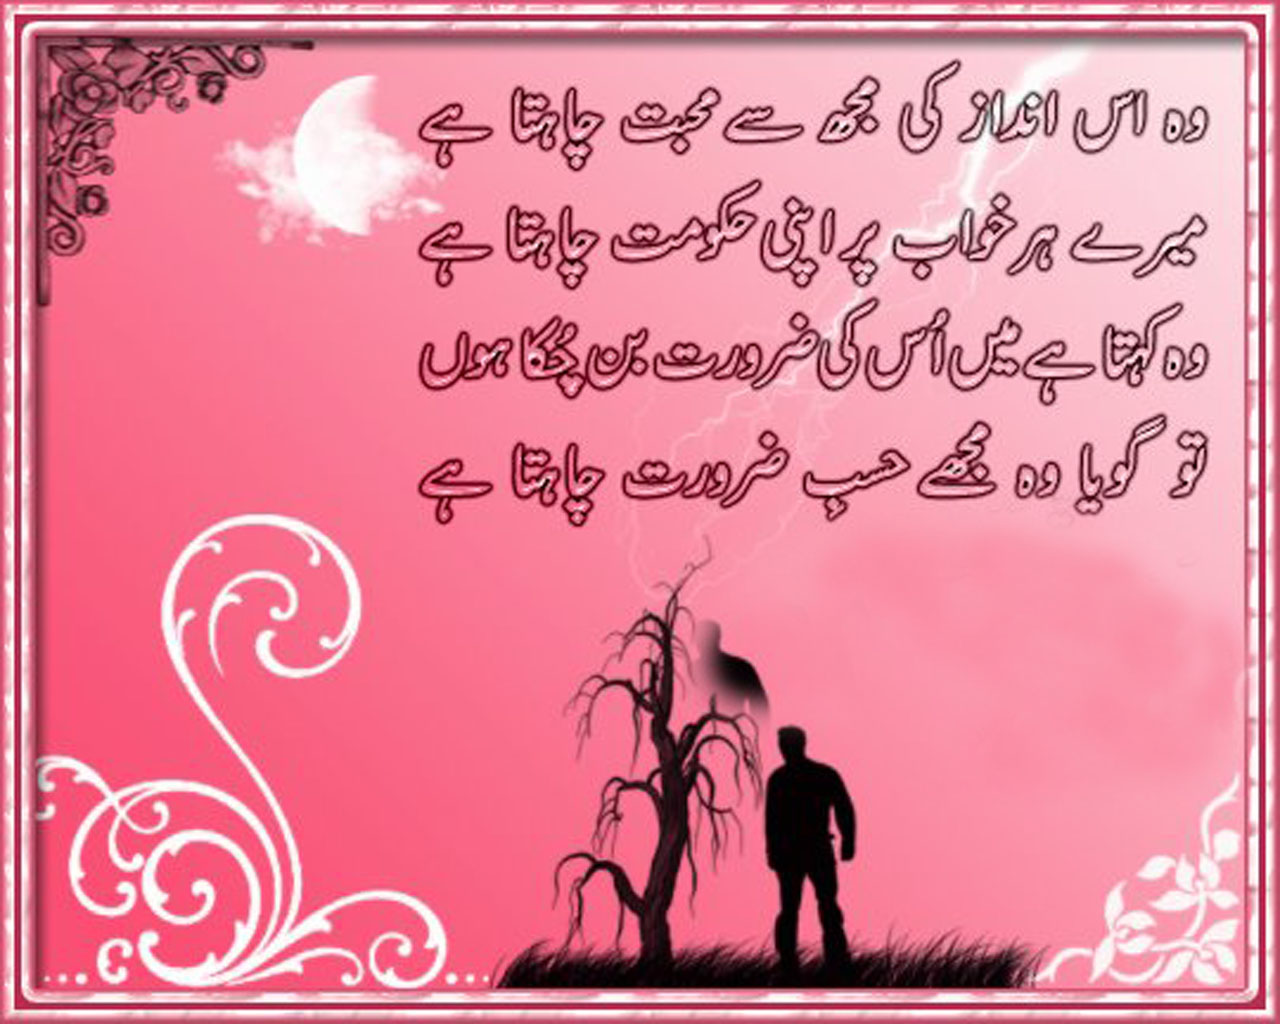 Free Download Poems Urdu Poetry Poetry Images English Poetry